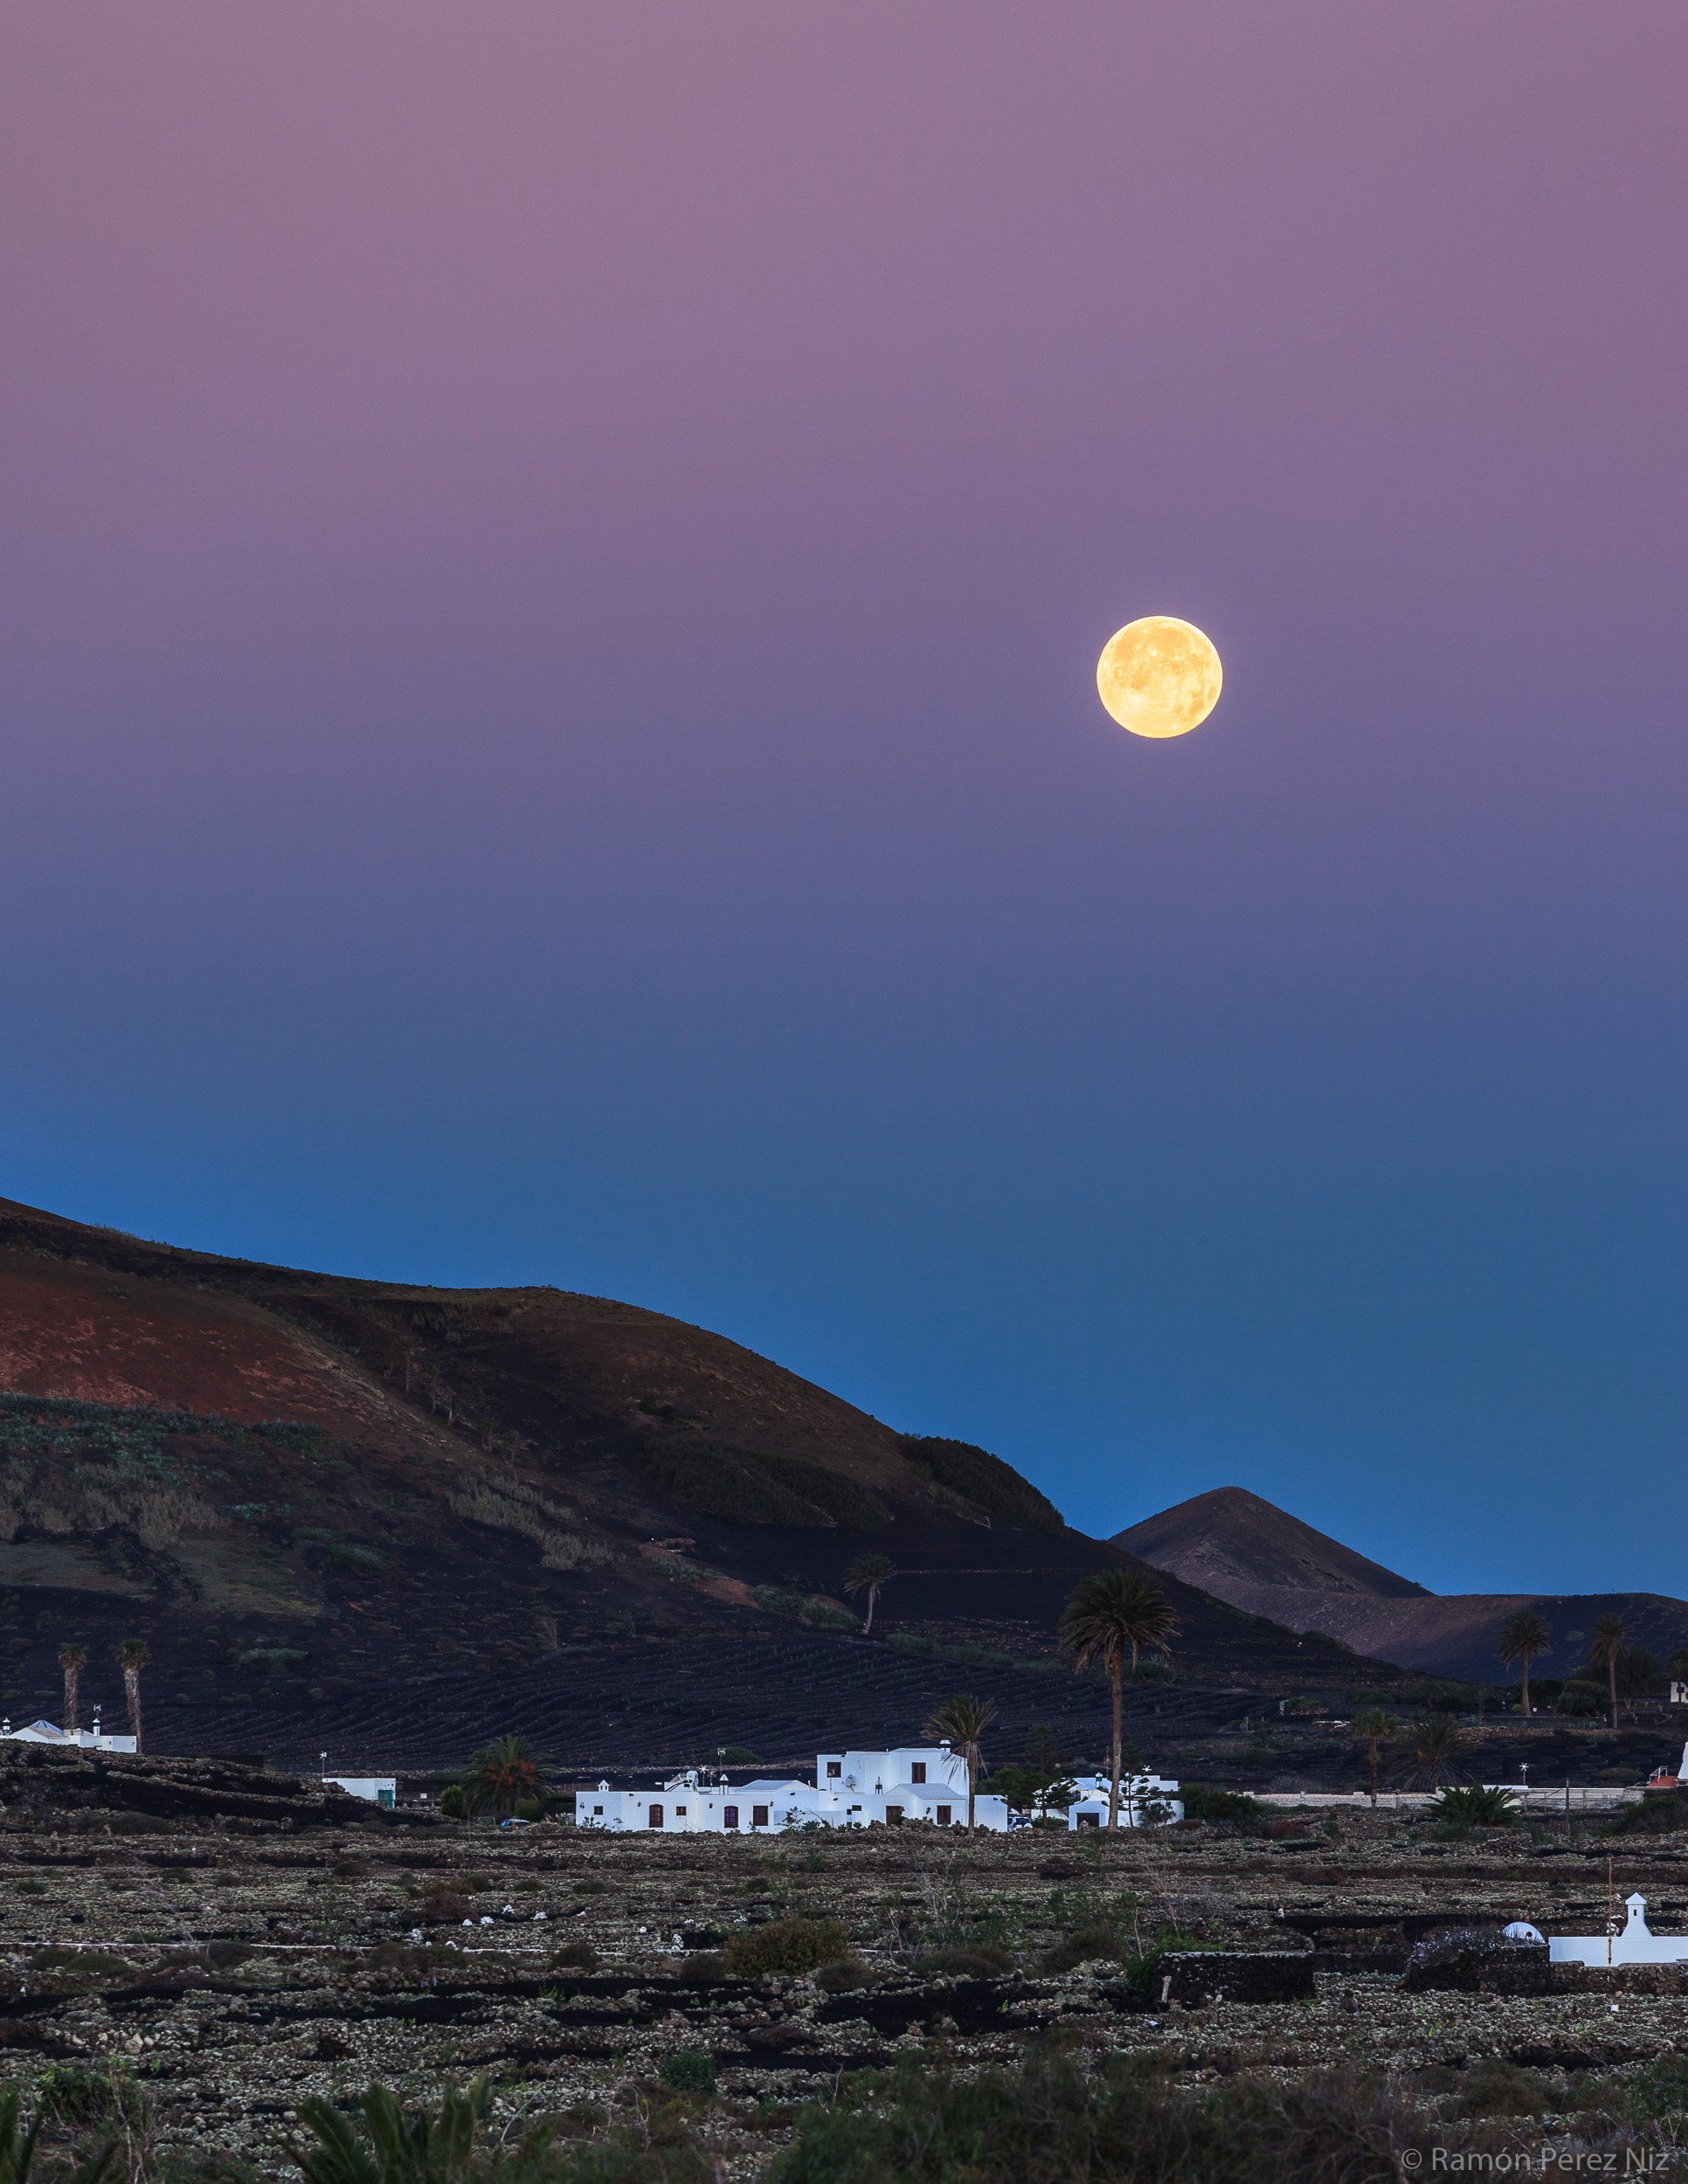 Foto de Ramón Pérez Niz, luna llena en Masdache